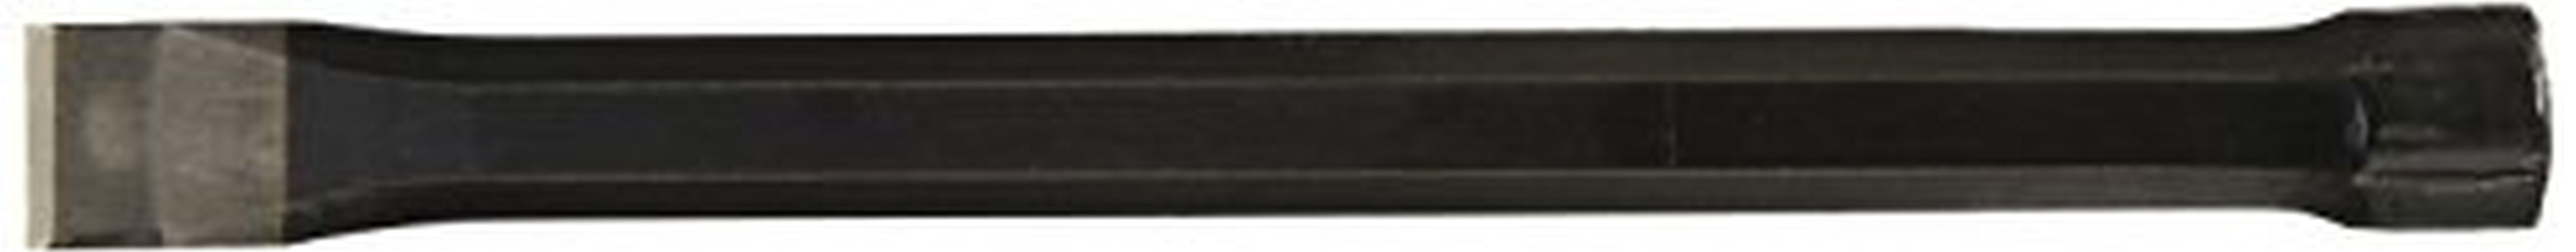 Kraft Tool GG365 Cold Chisel 12 x 1-Inch